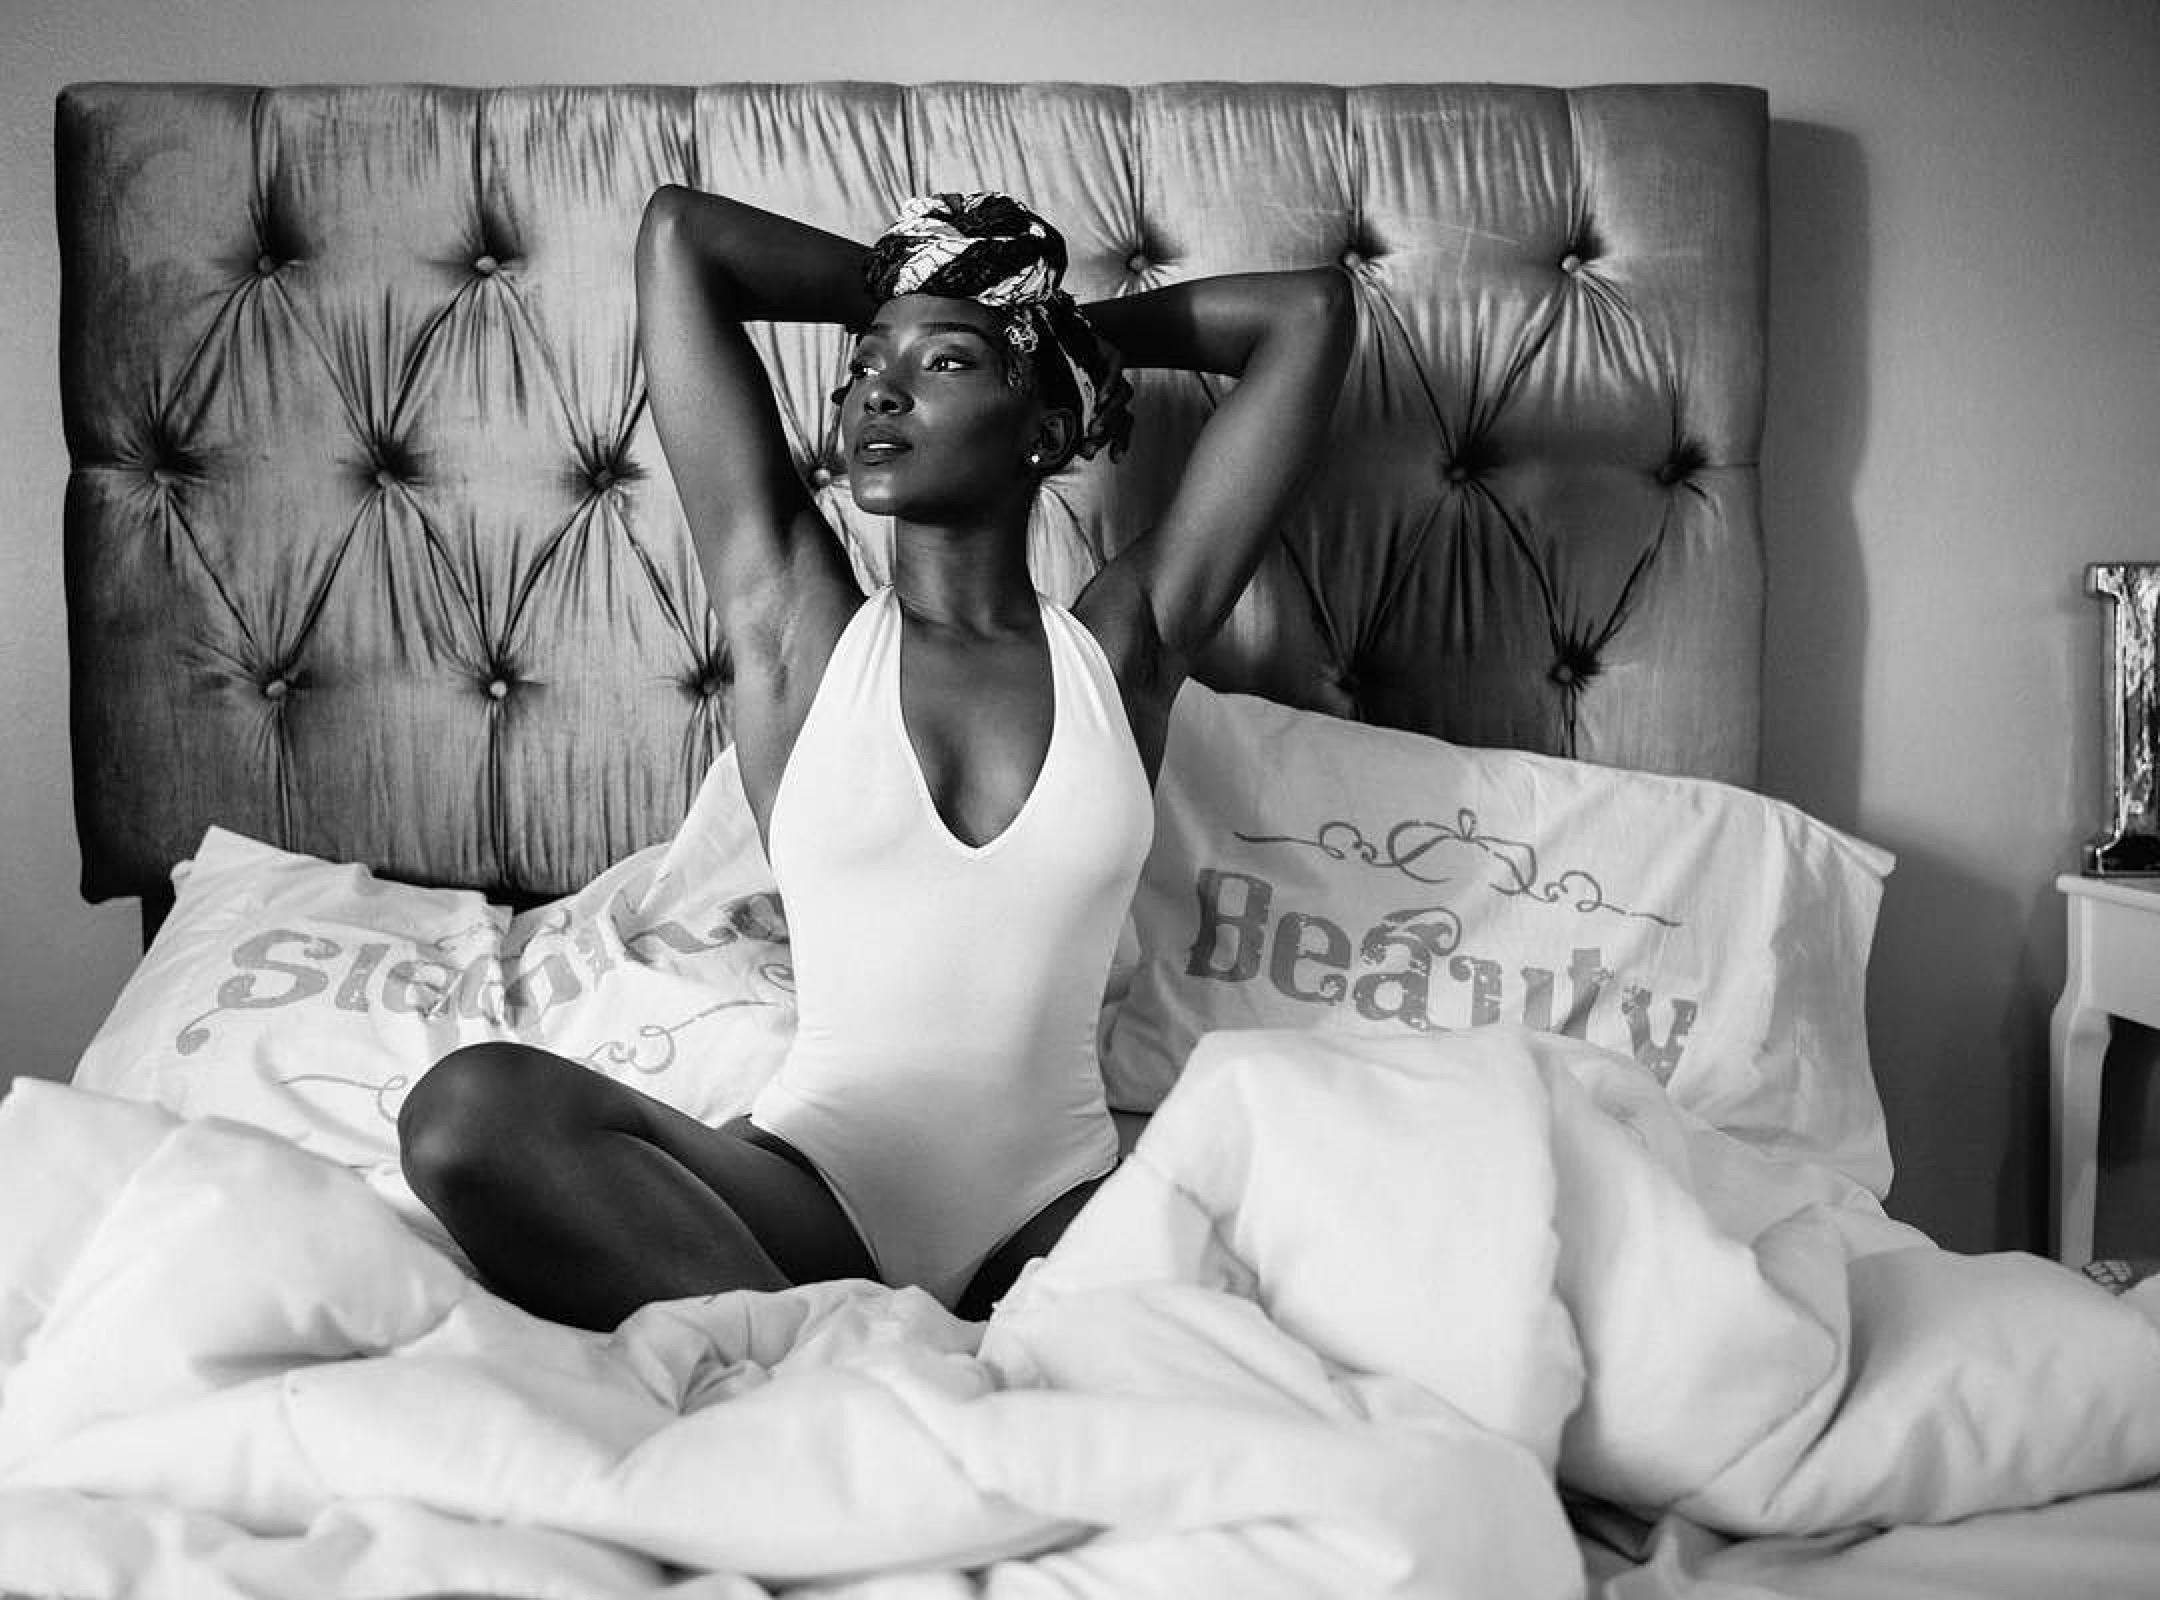 Khadija Shari - Trinidad & Tobago/Brooklyn